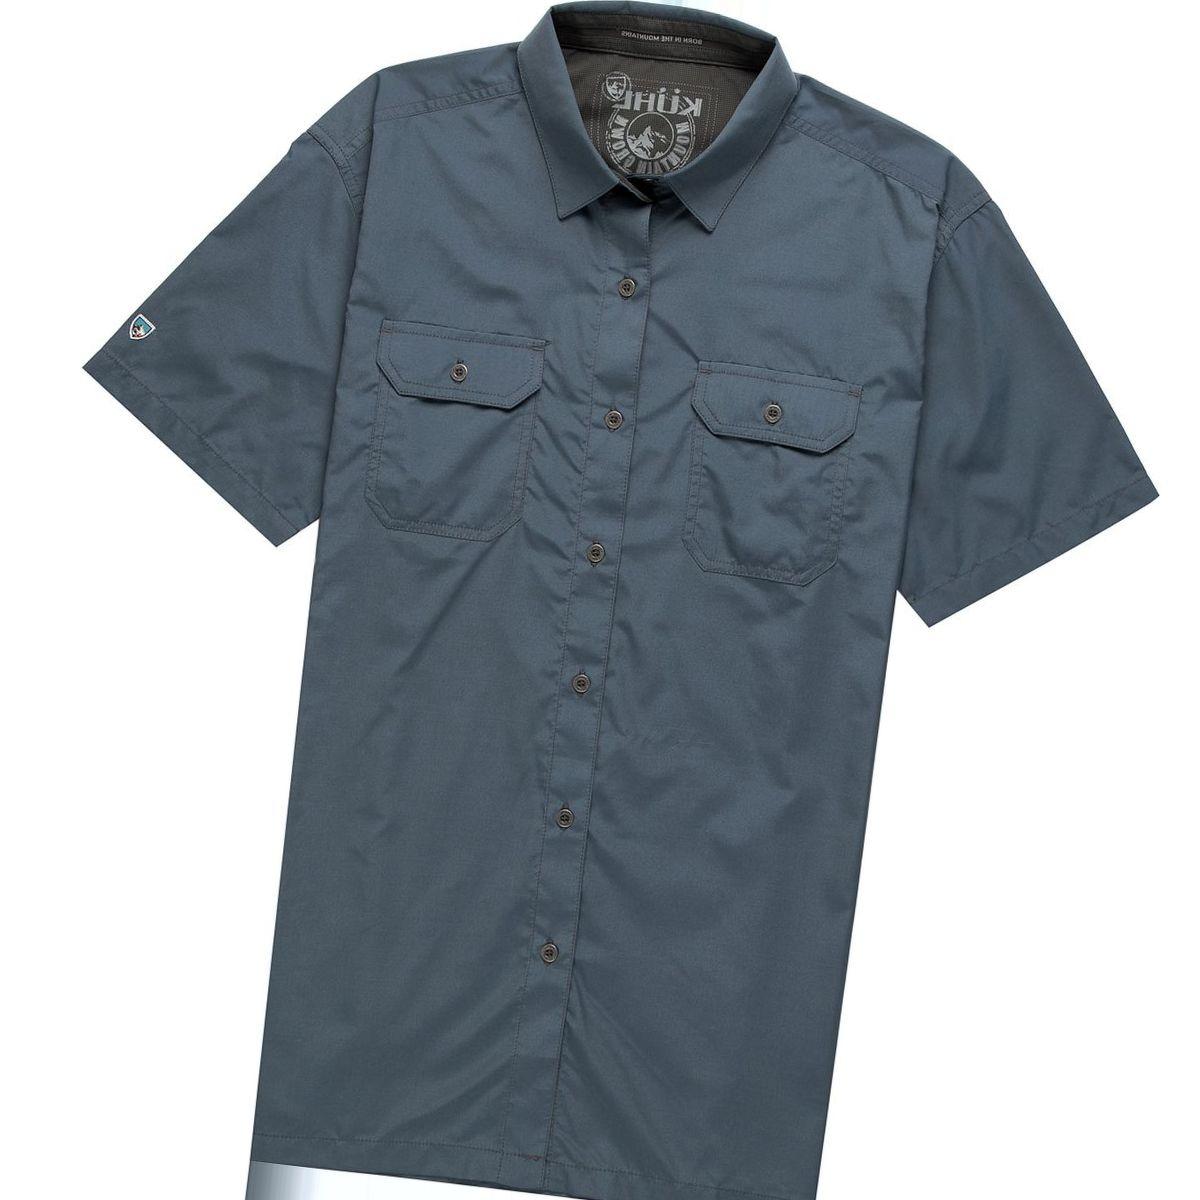 KUHL Response Shirt - Men's